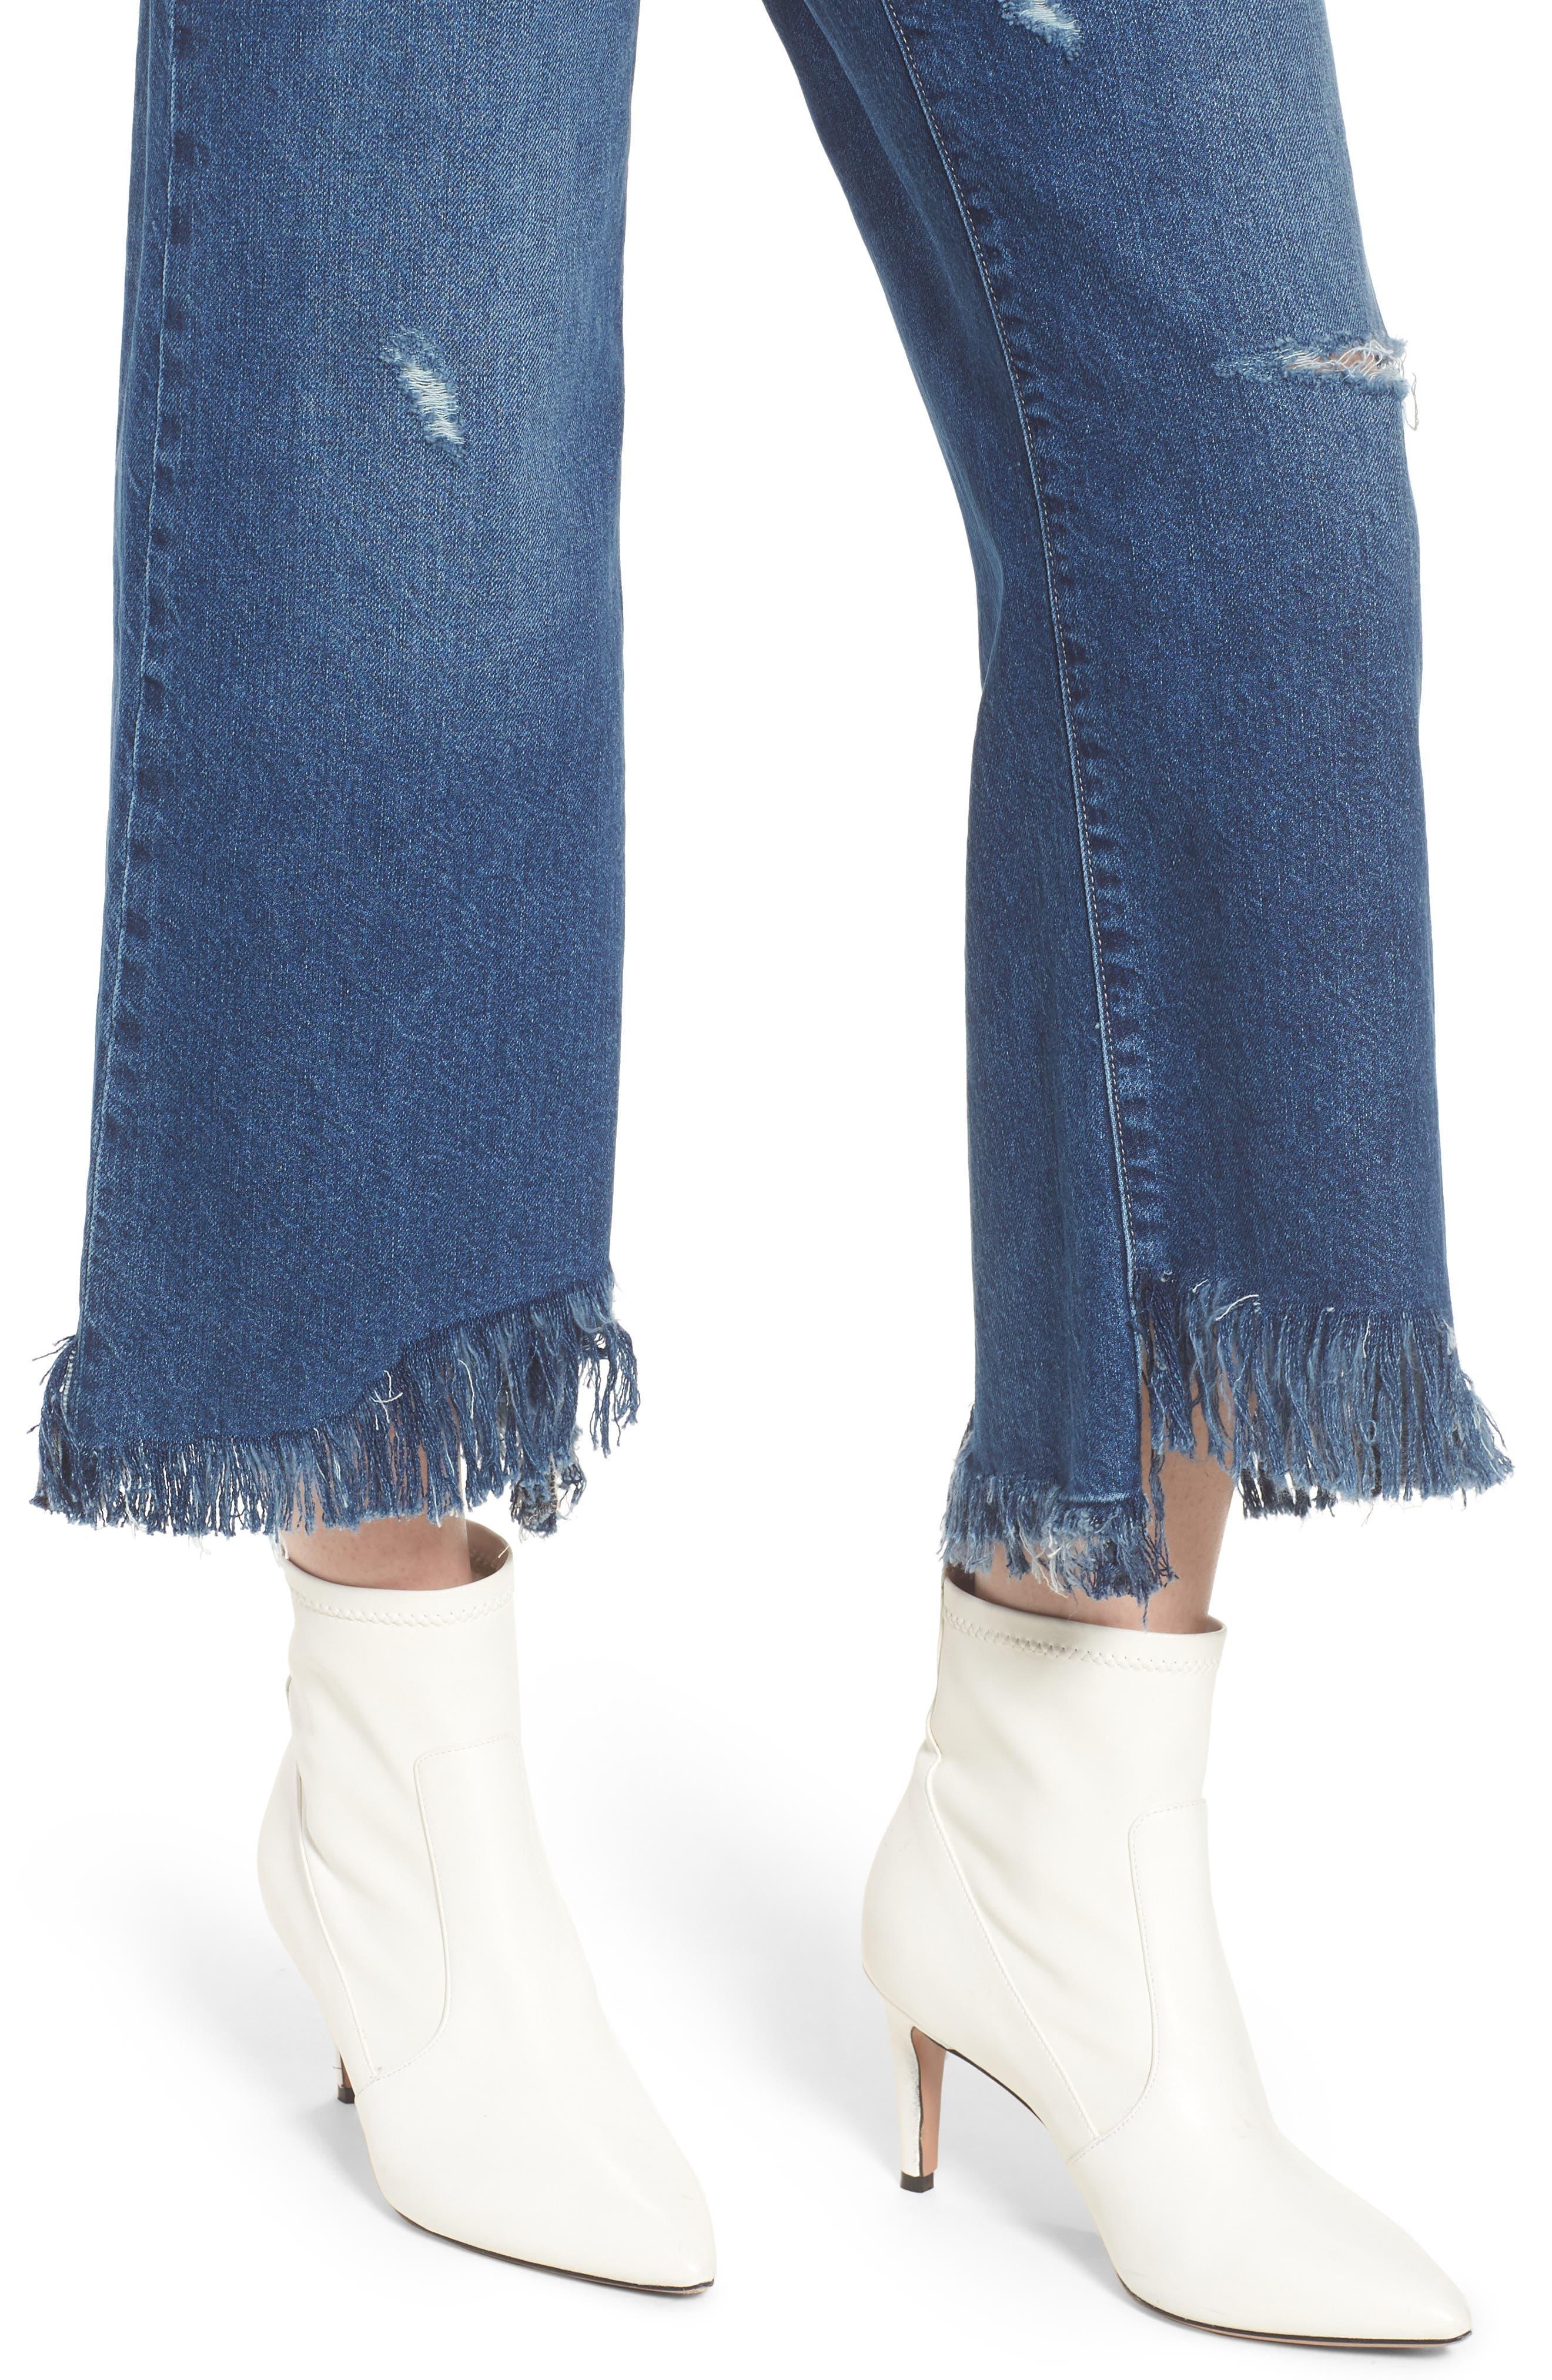 Hepburn High Waist Wide Leg Jeans,                             Alternate thumbnail 4, color,